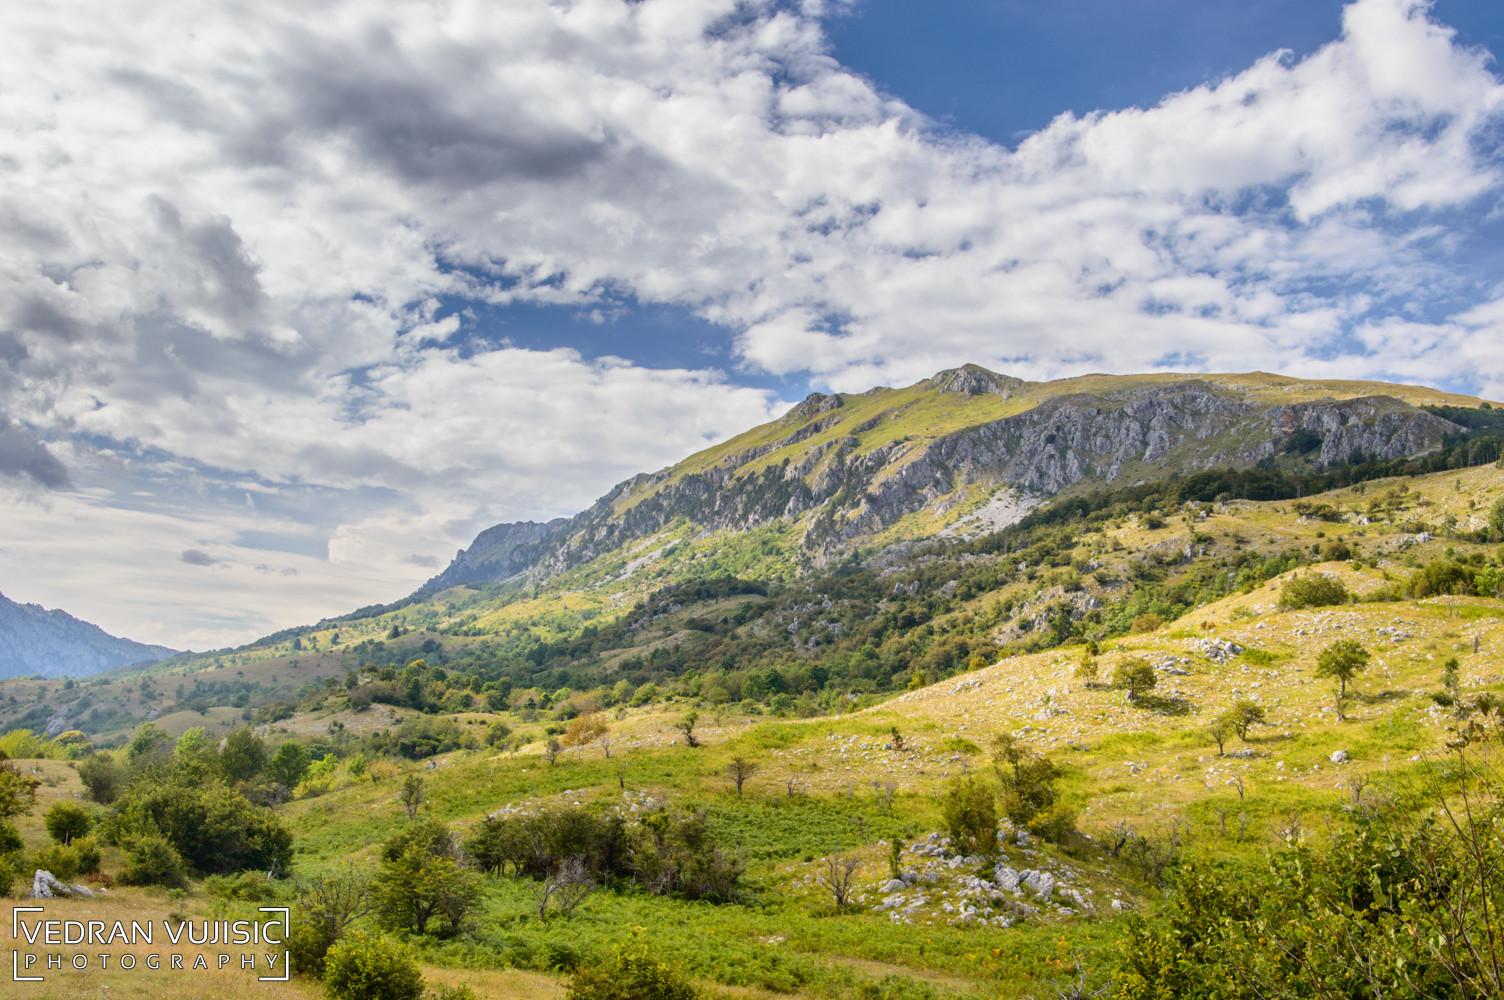 Ljetnji pejzaž Crna Gora